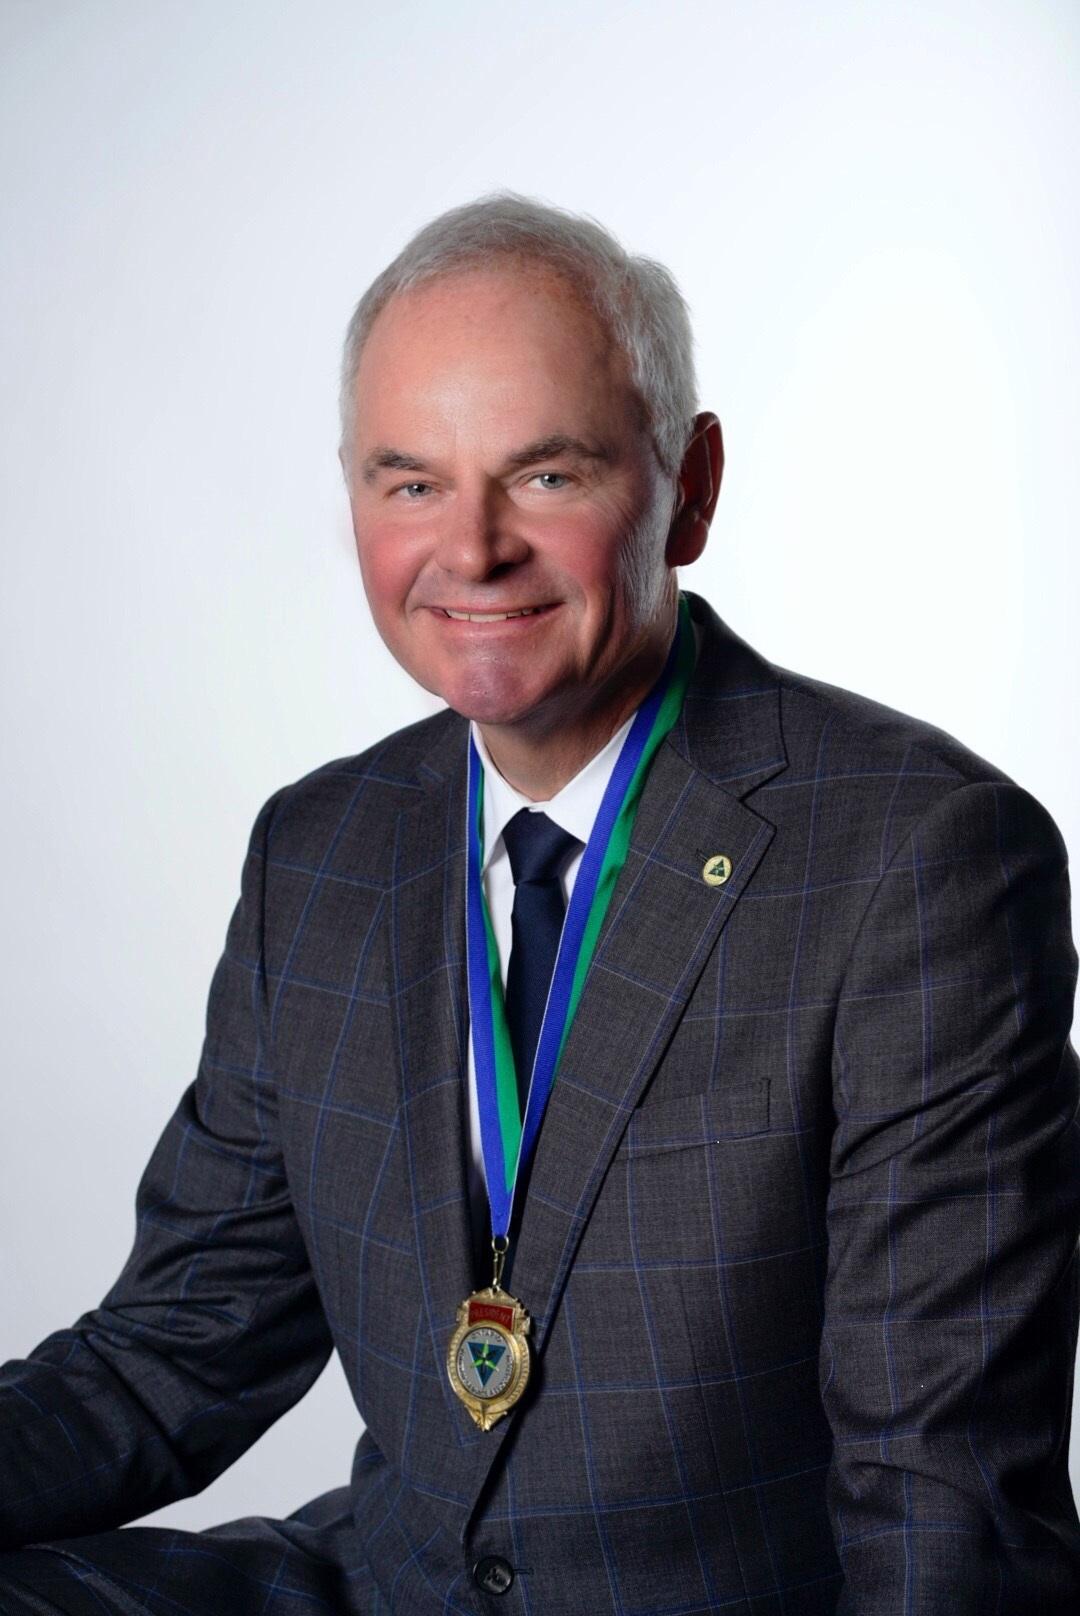 Scott MacCoubrey, President